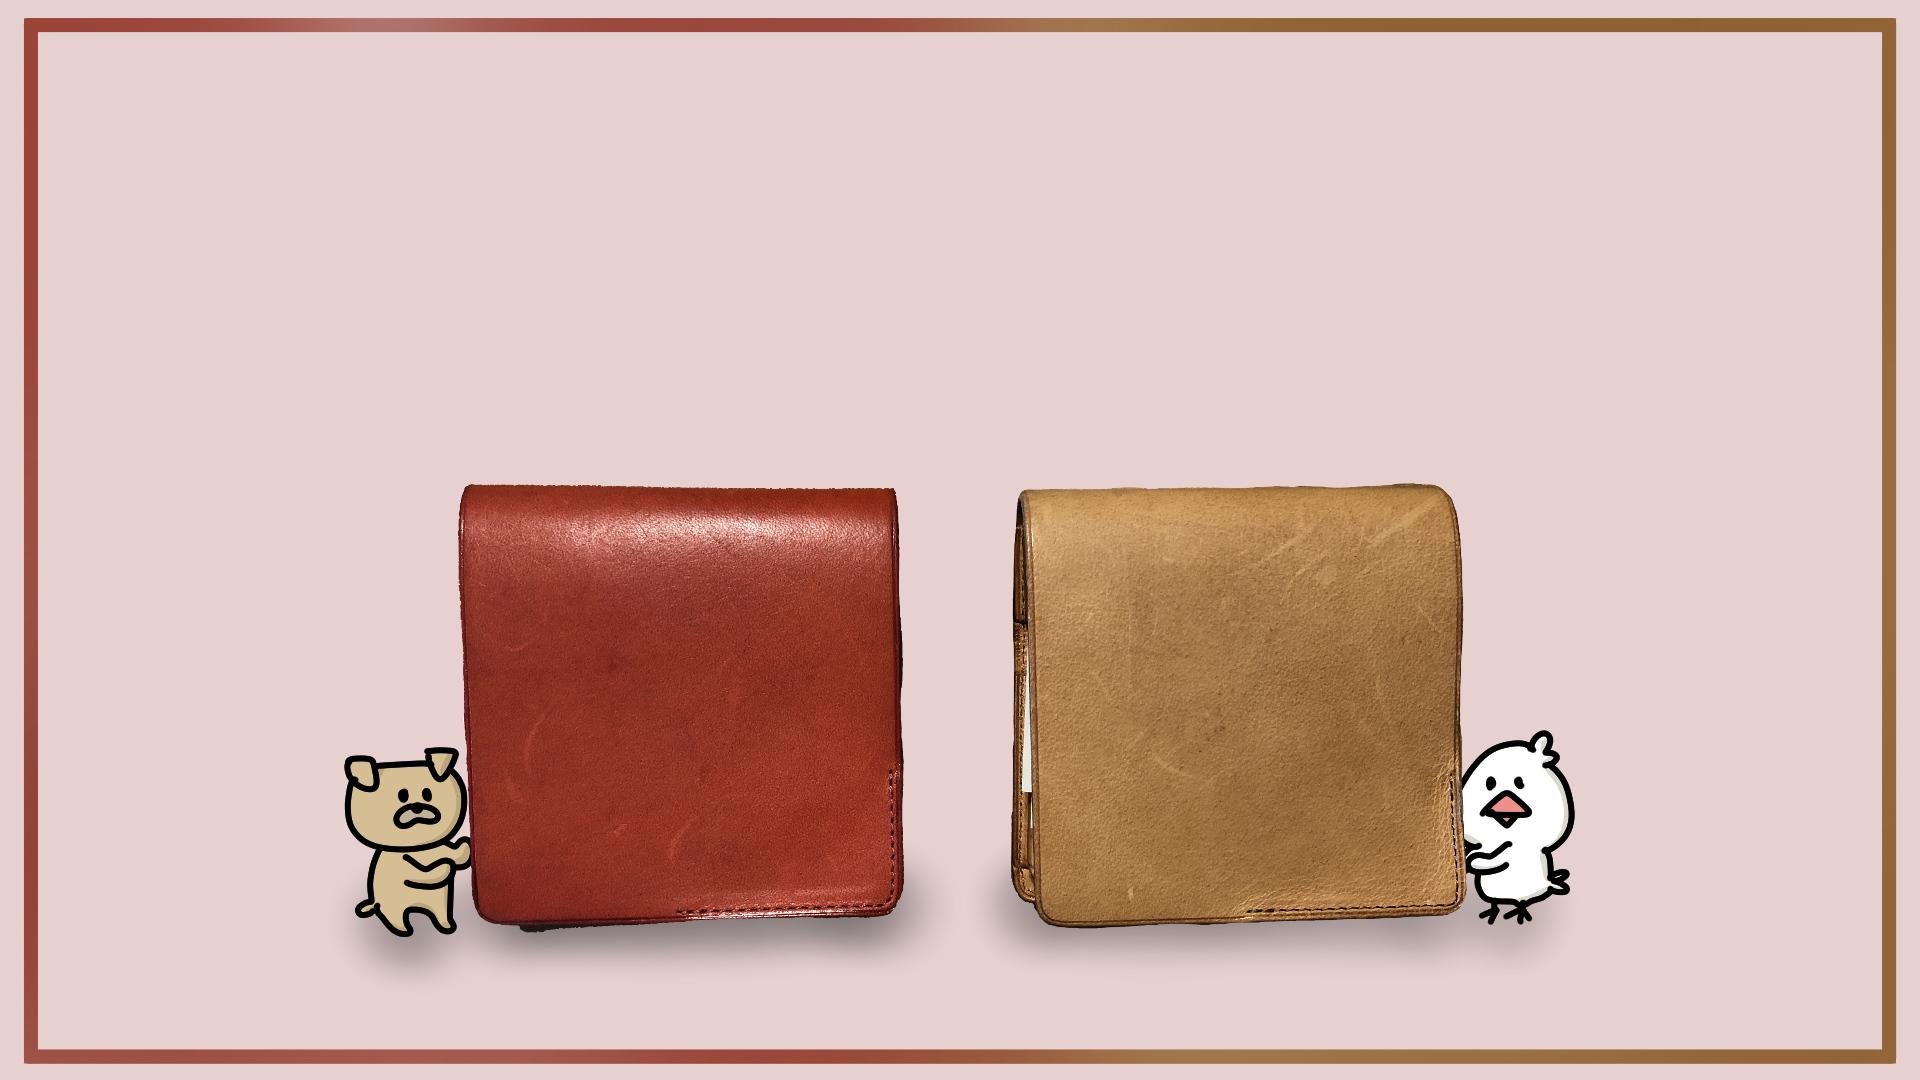 SYRINXのお財布、その後